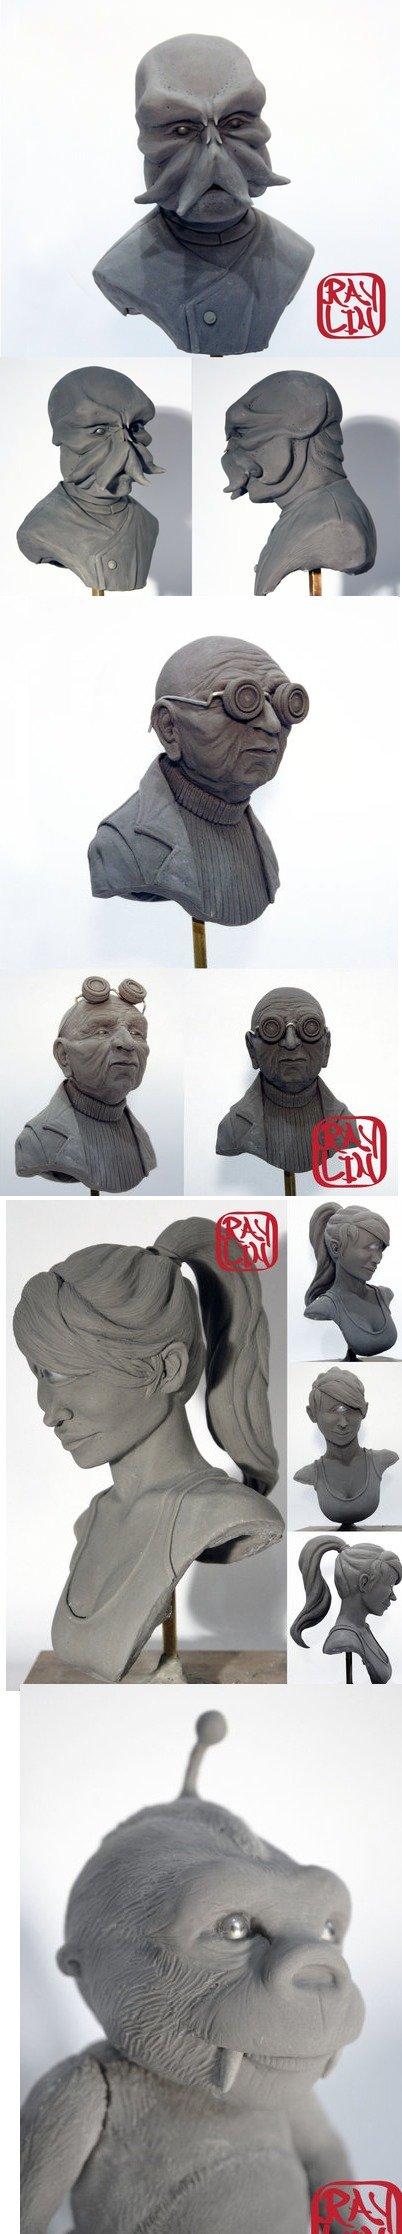 Futurama Fan Sculptures. Zoidberg, Farnsworth, Leela, Nibbler.. I couldn't resist.